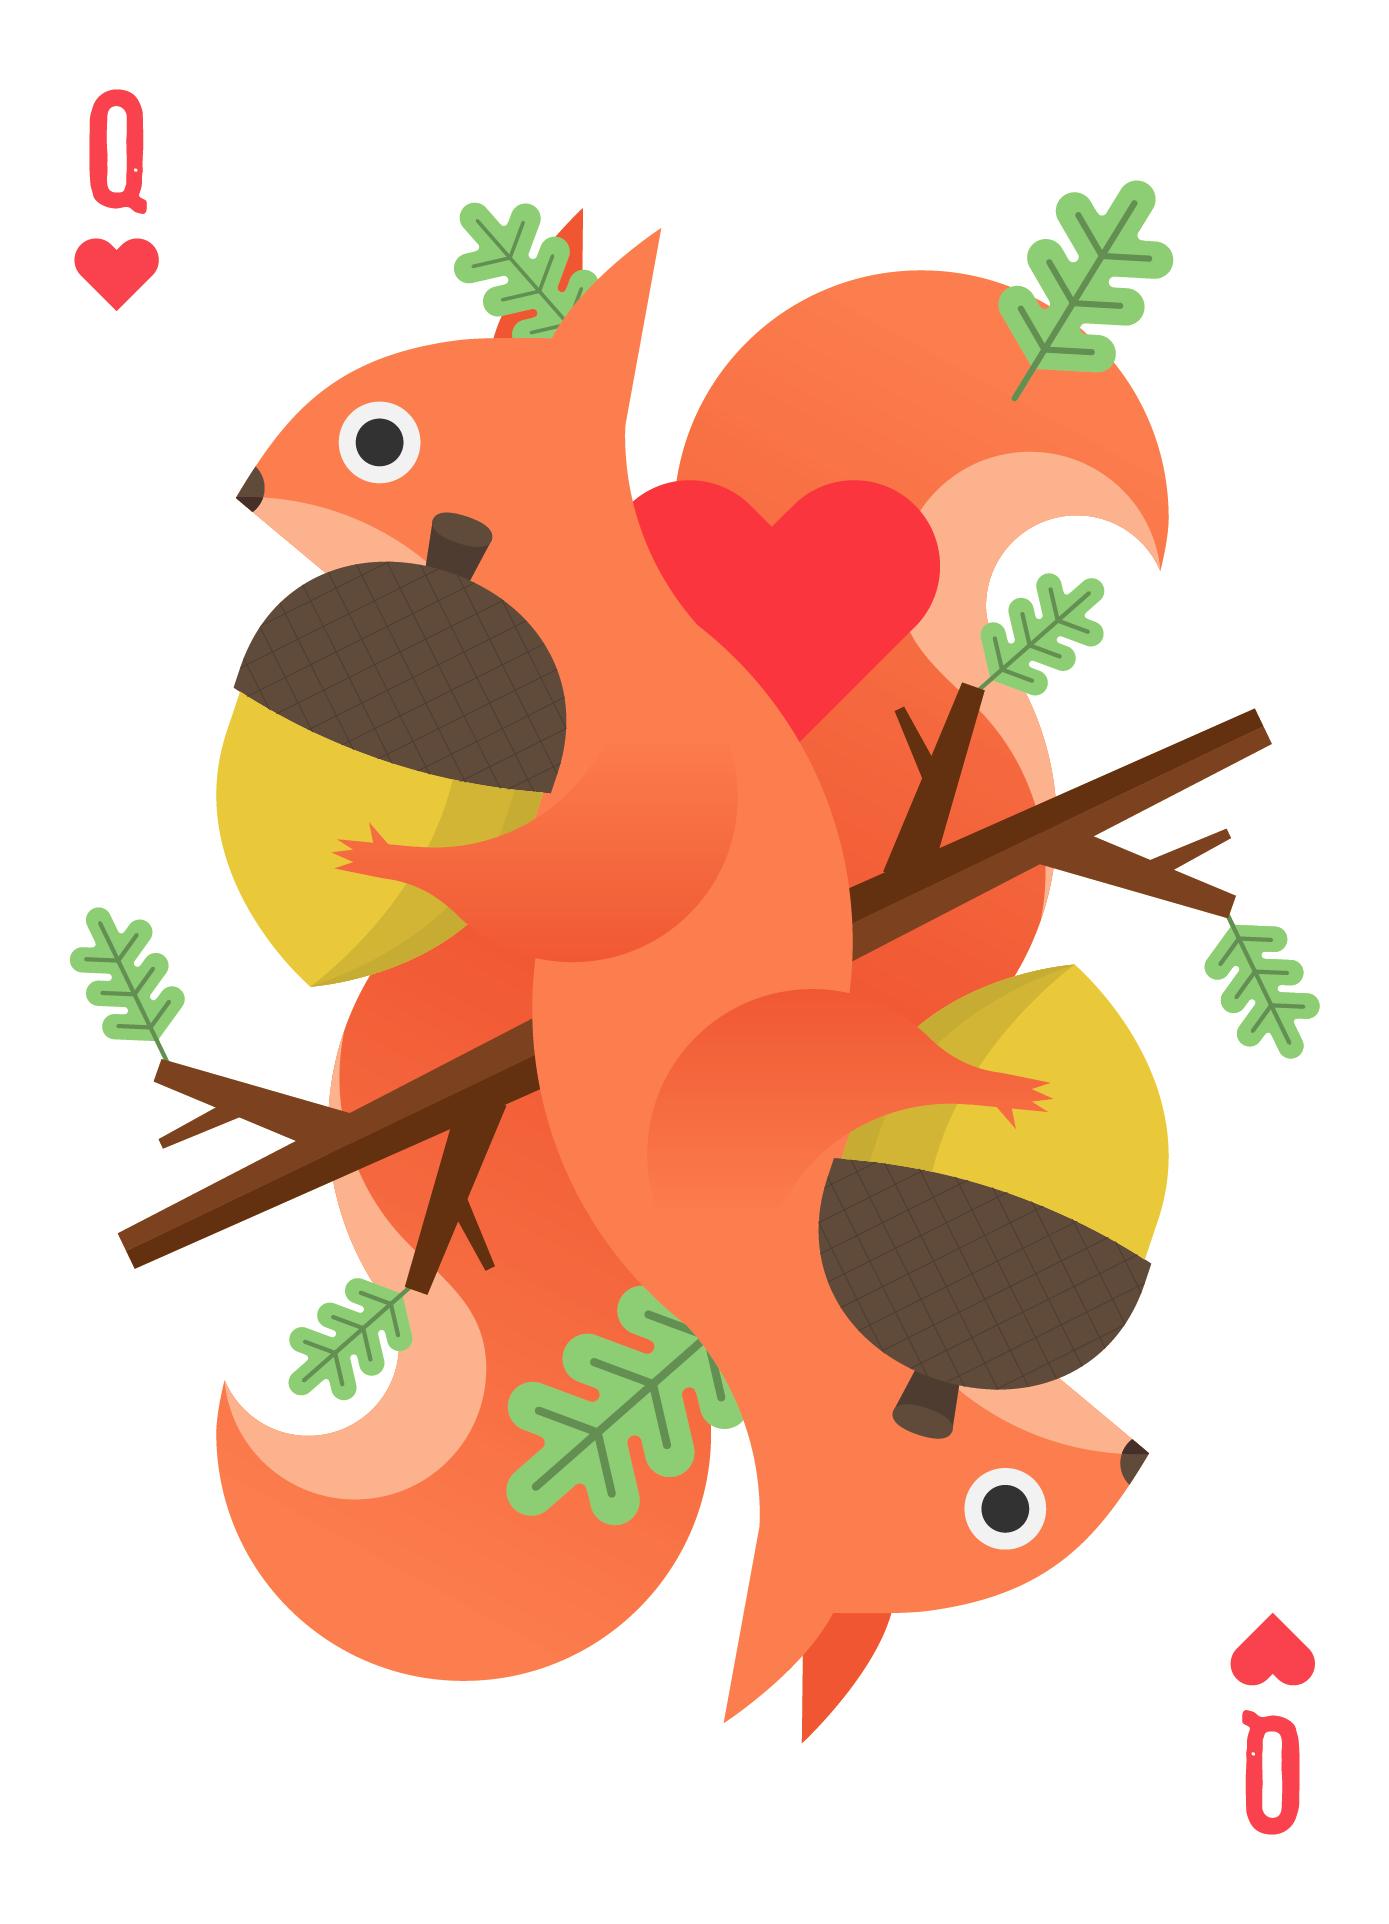 cards_of_luck_queen_heart.png